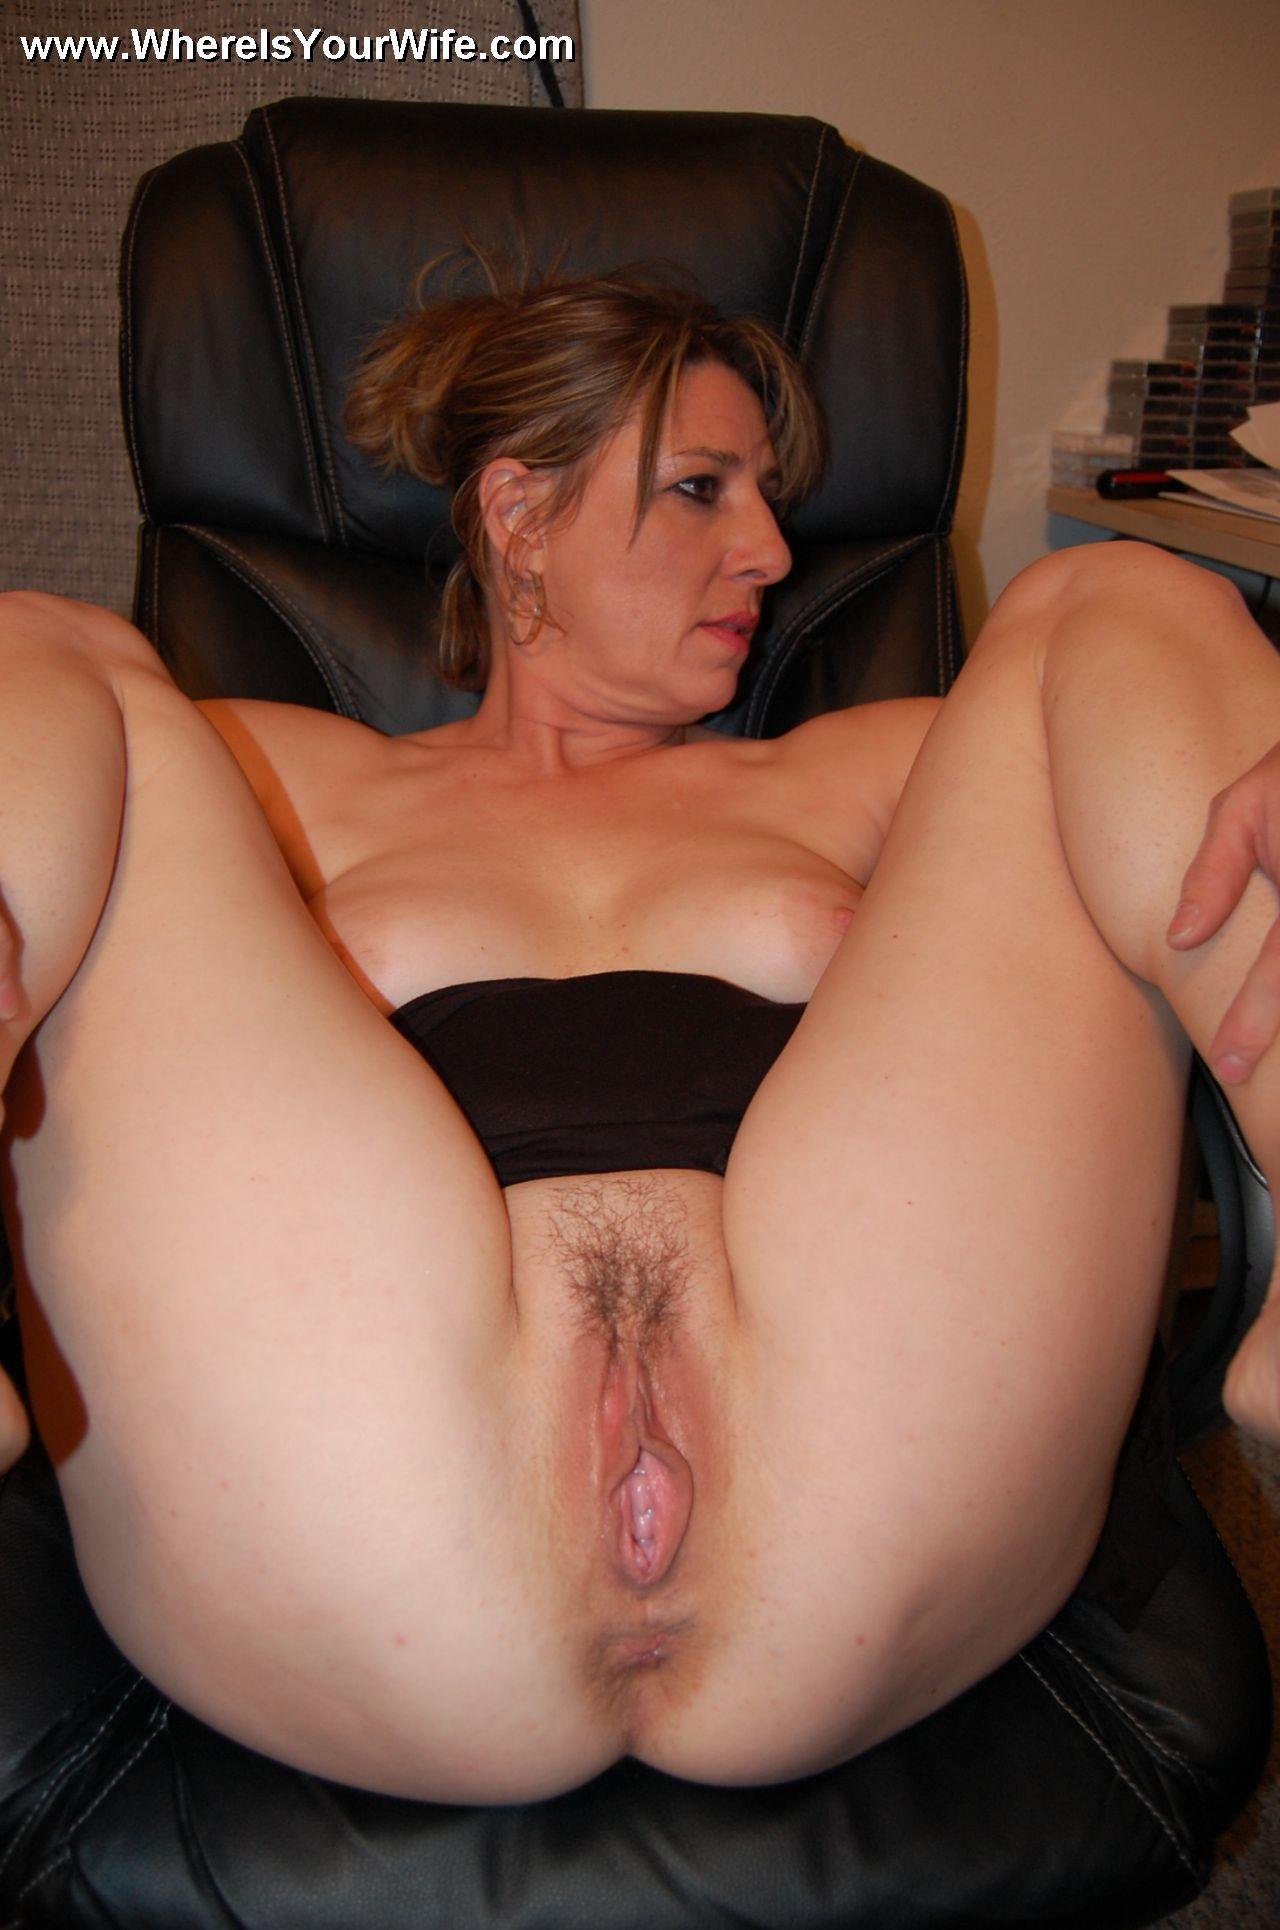 Pic milf mature Nude Mature